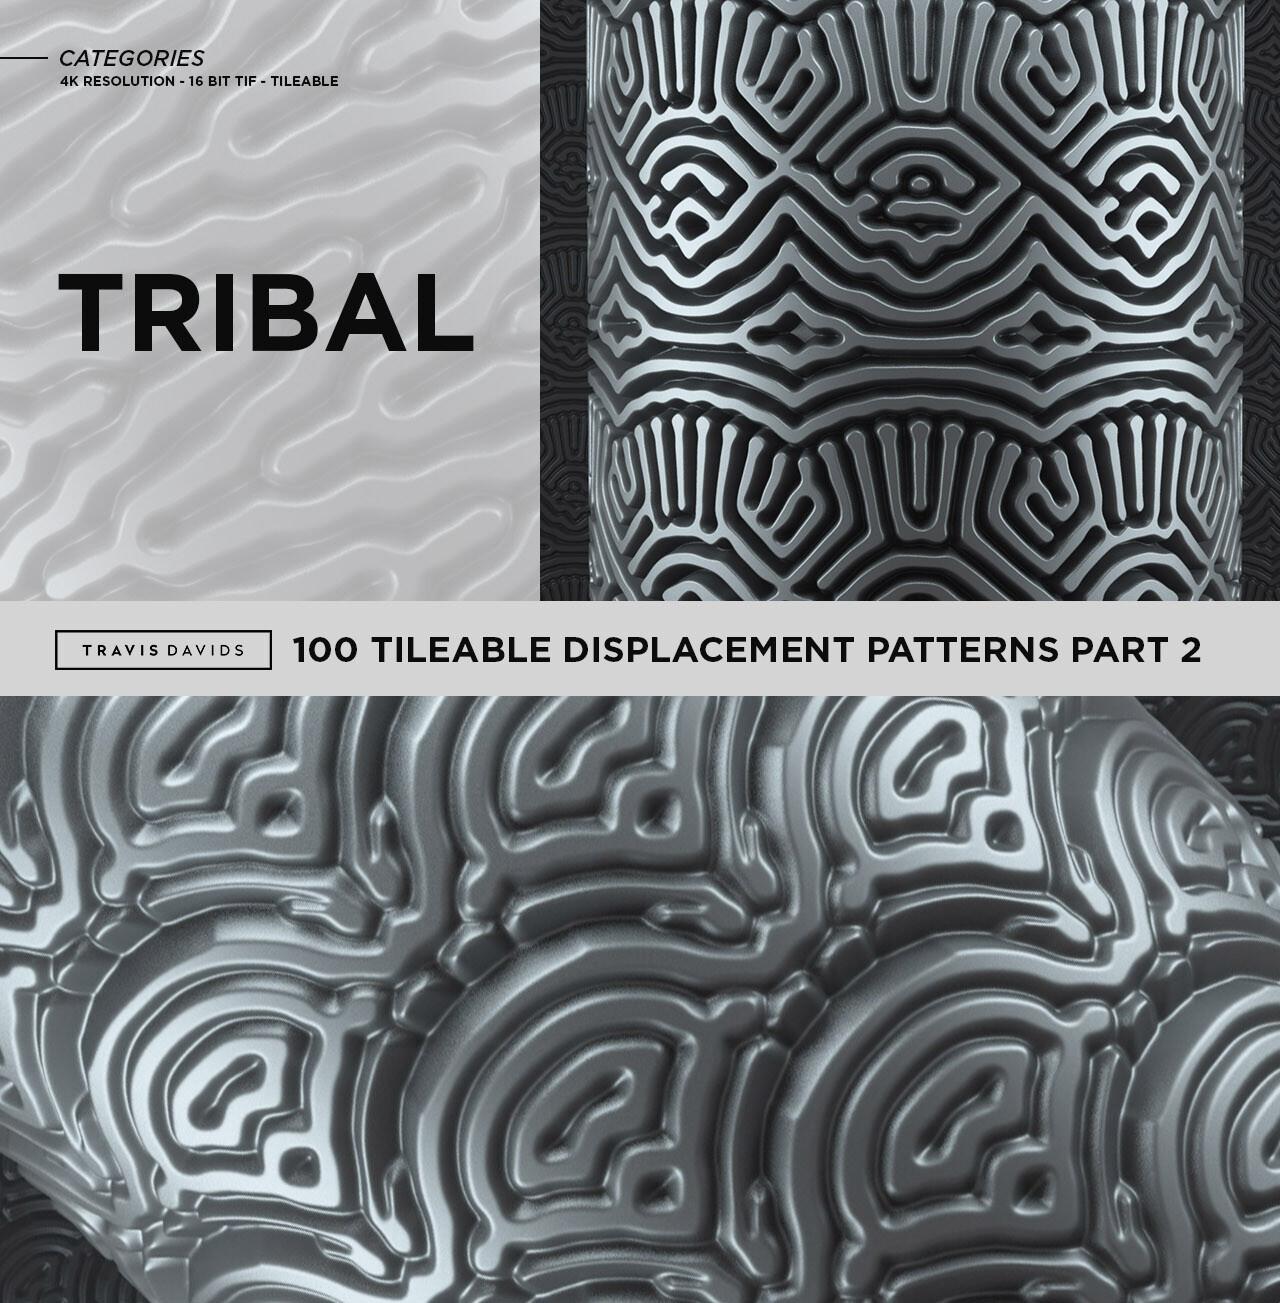 Travis davids categories tribal